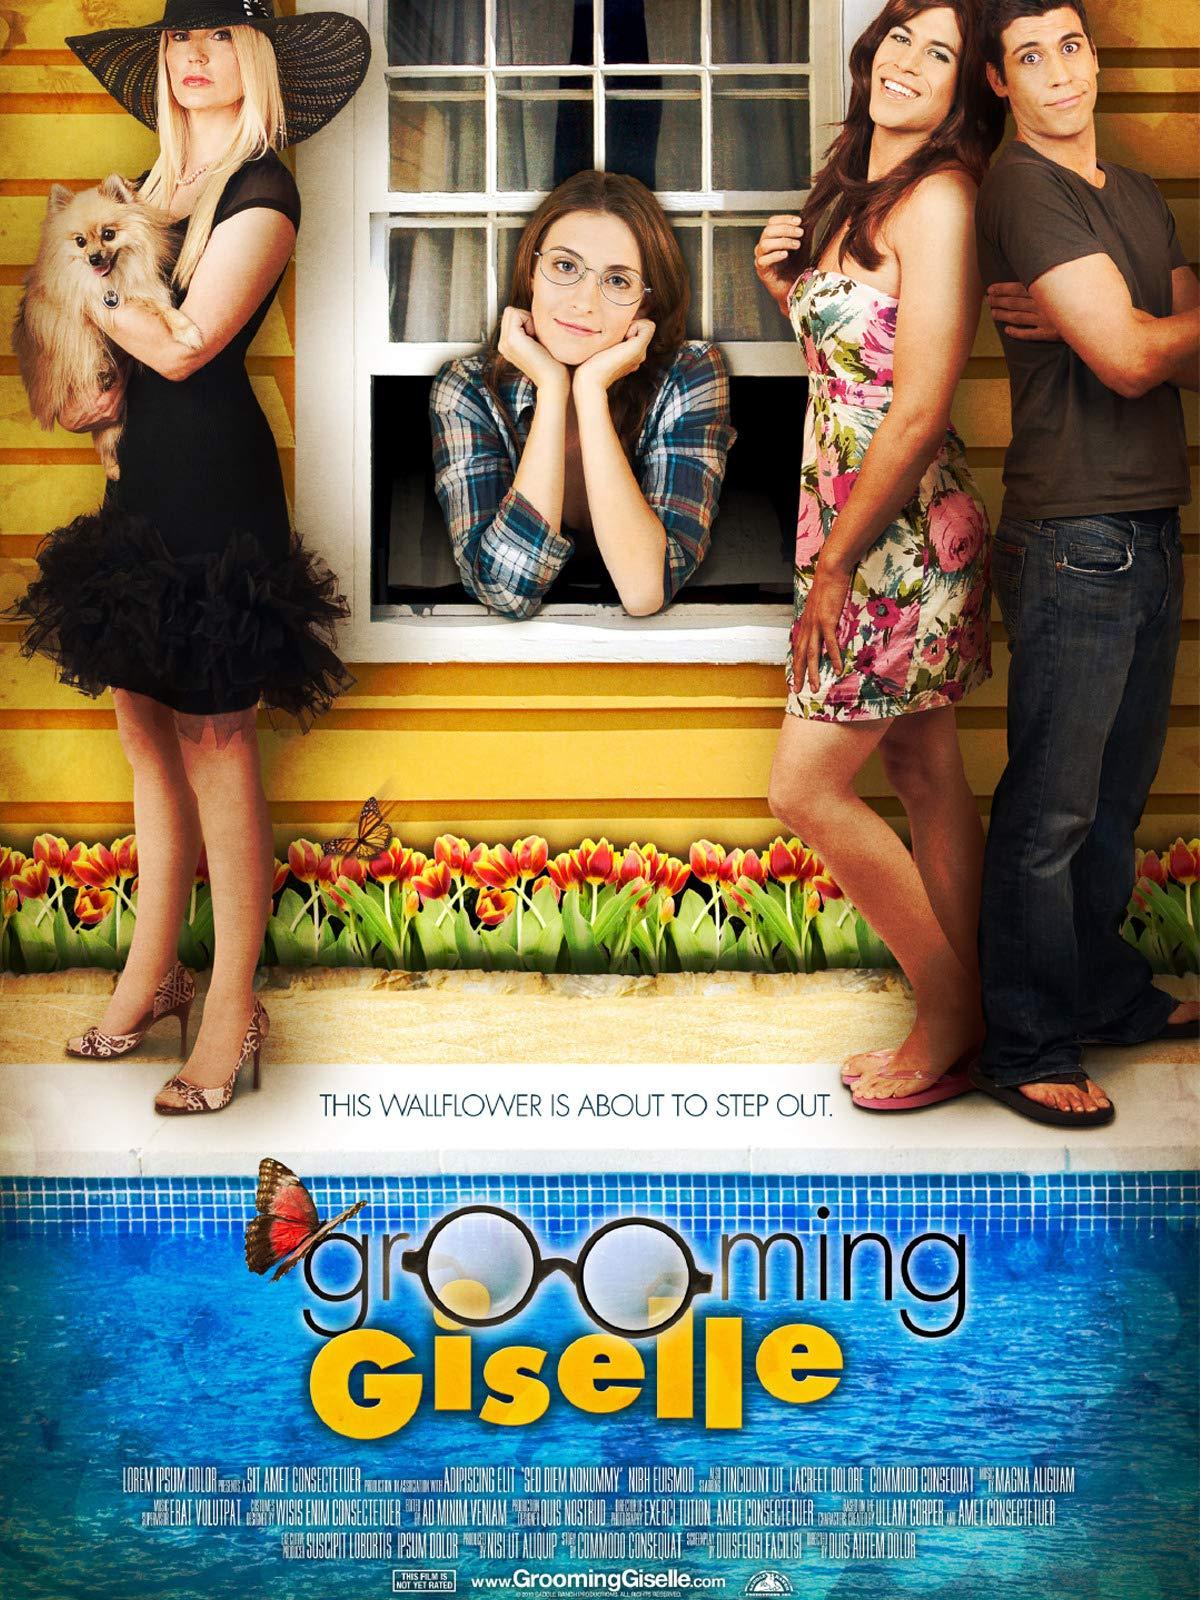 Grooming Giselle